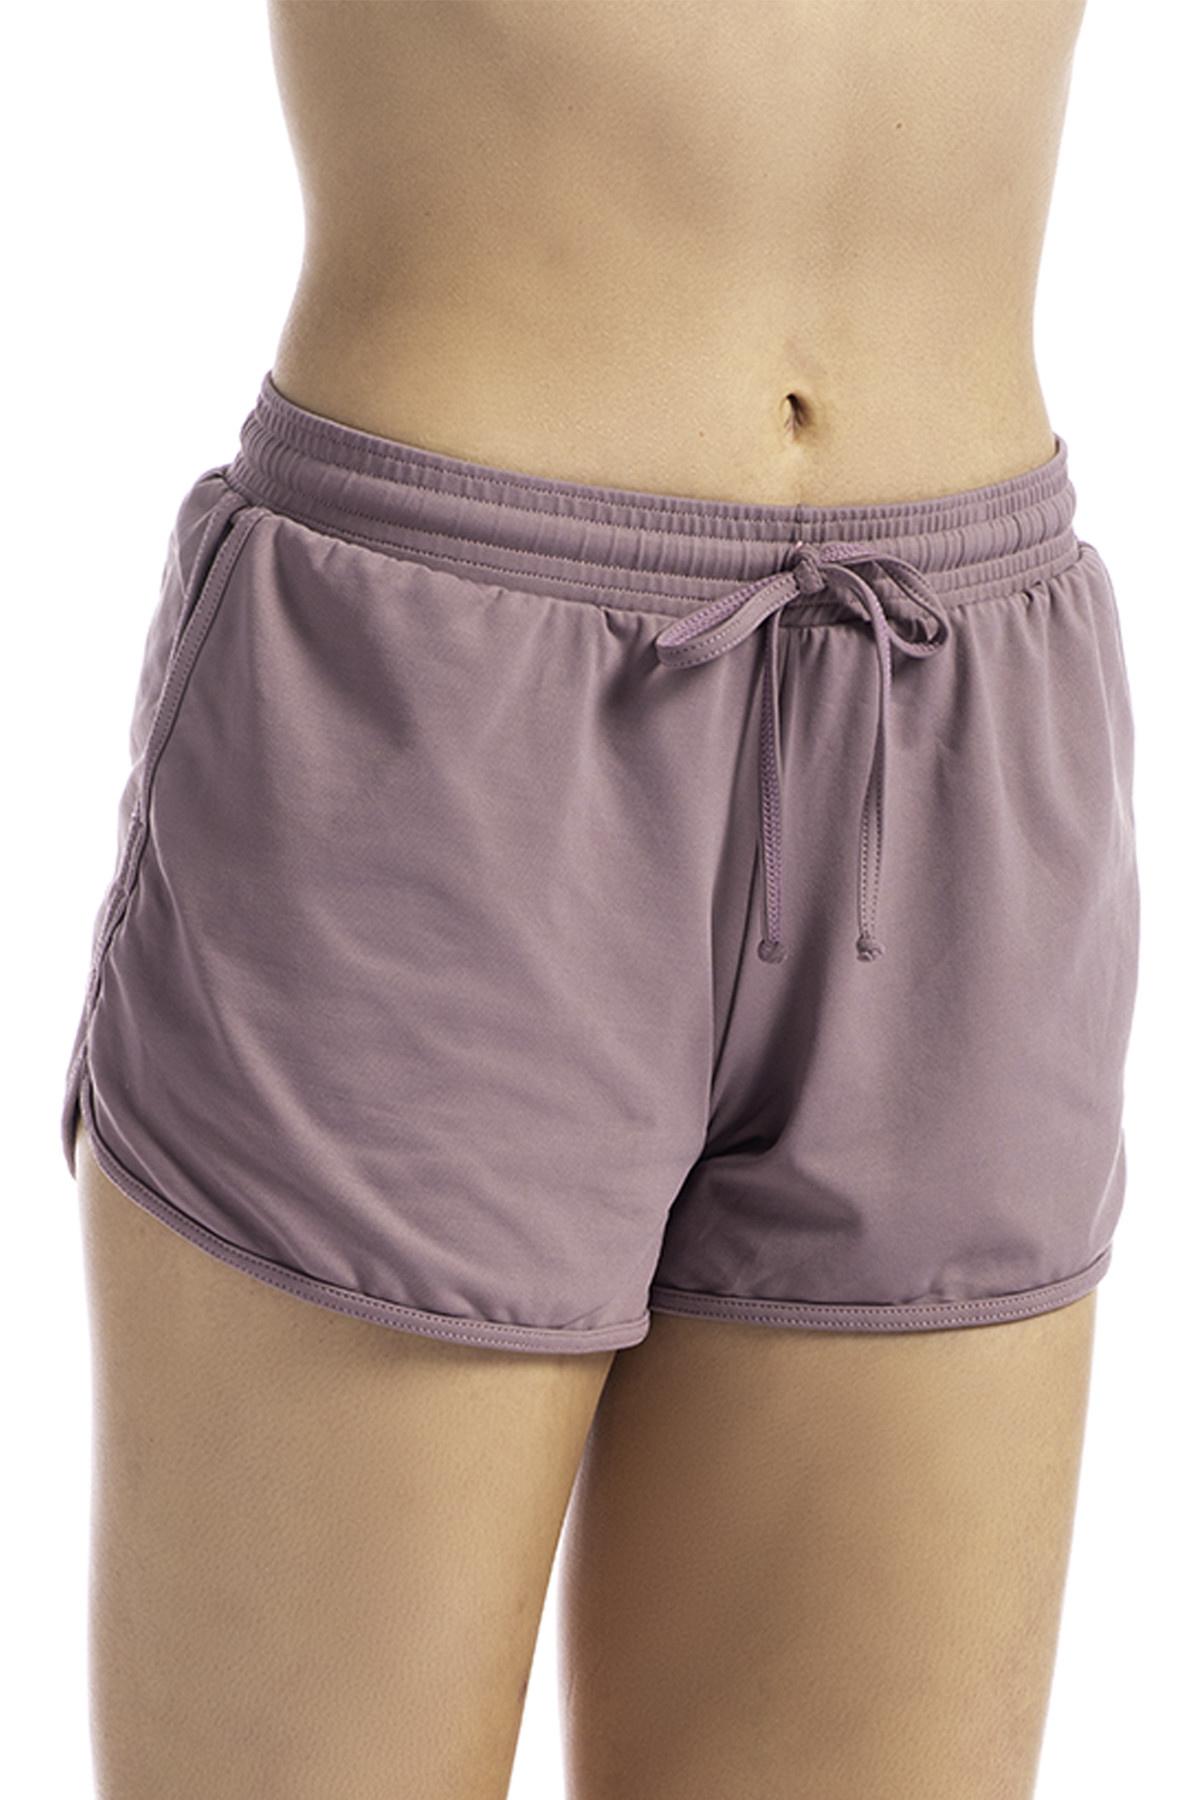 SoDanca RDE-1992-Microfiber Shorts